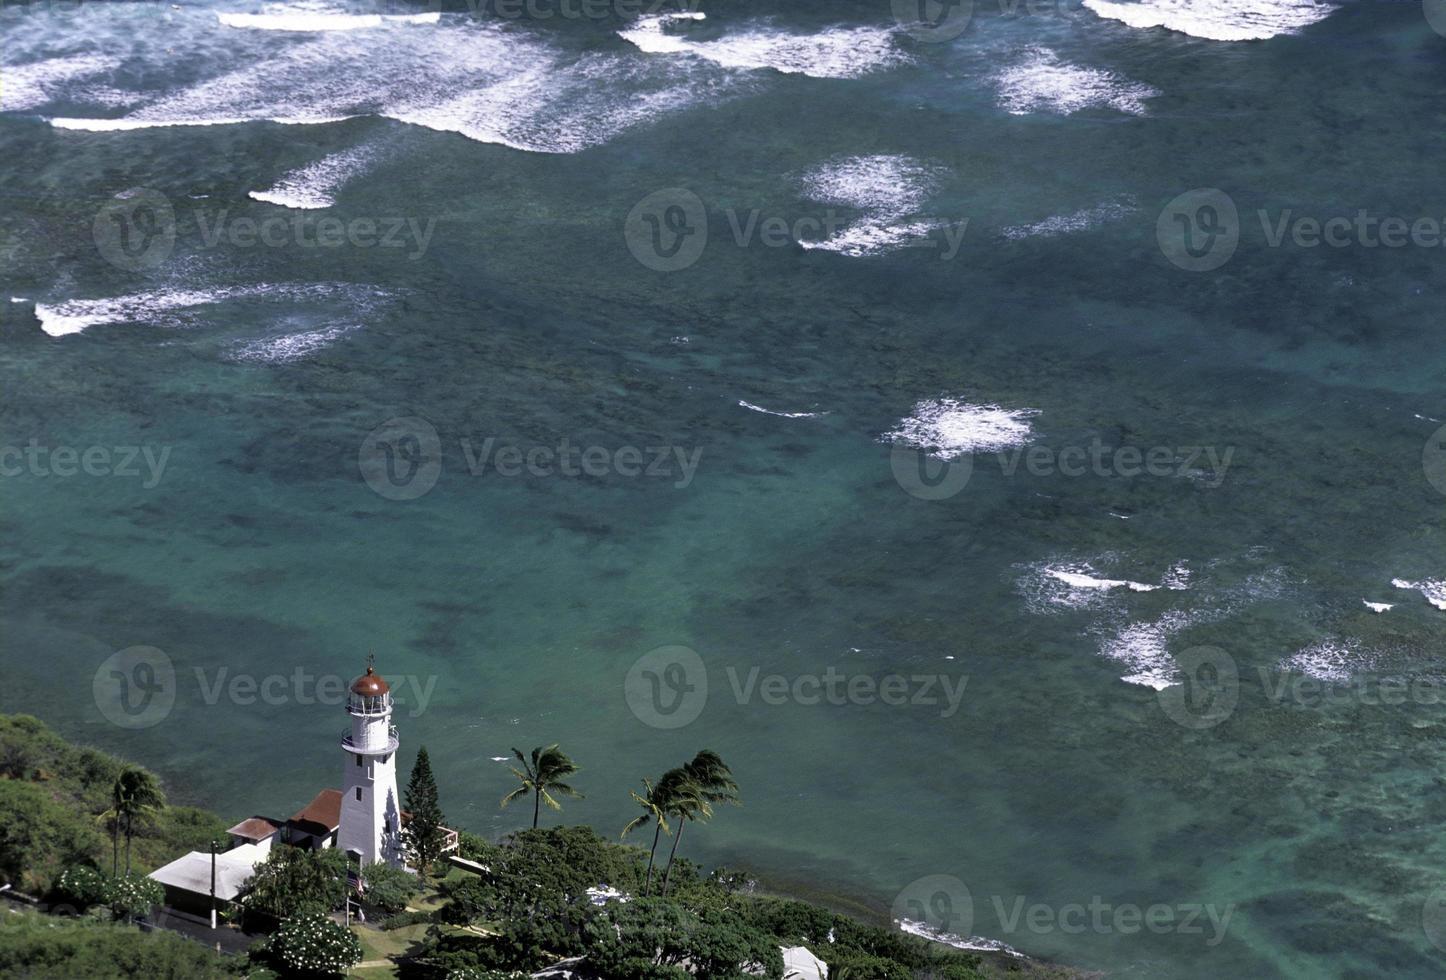 usa hawaii o'ahu, Leuchtturm am Diamantenkopf. foto